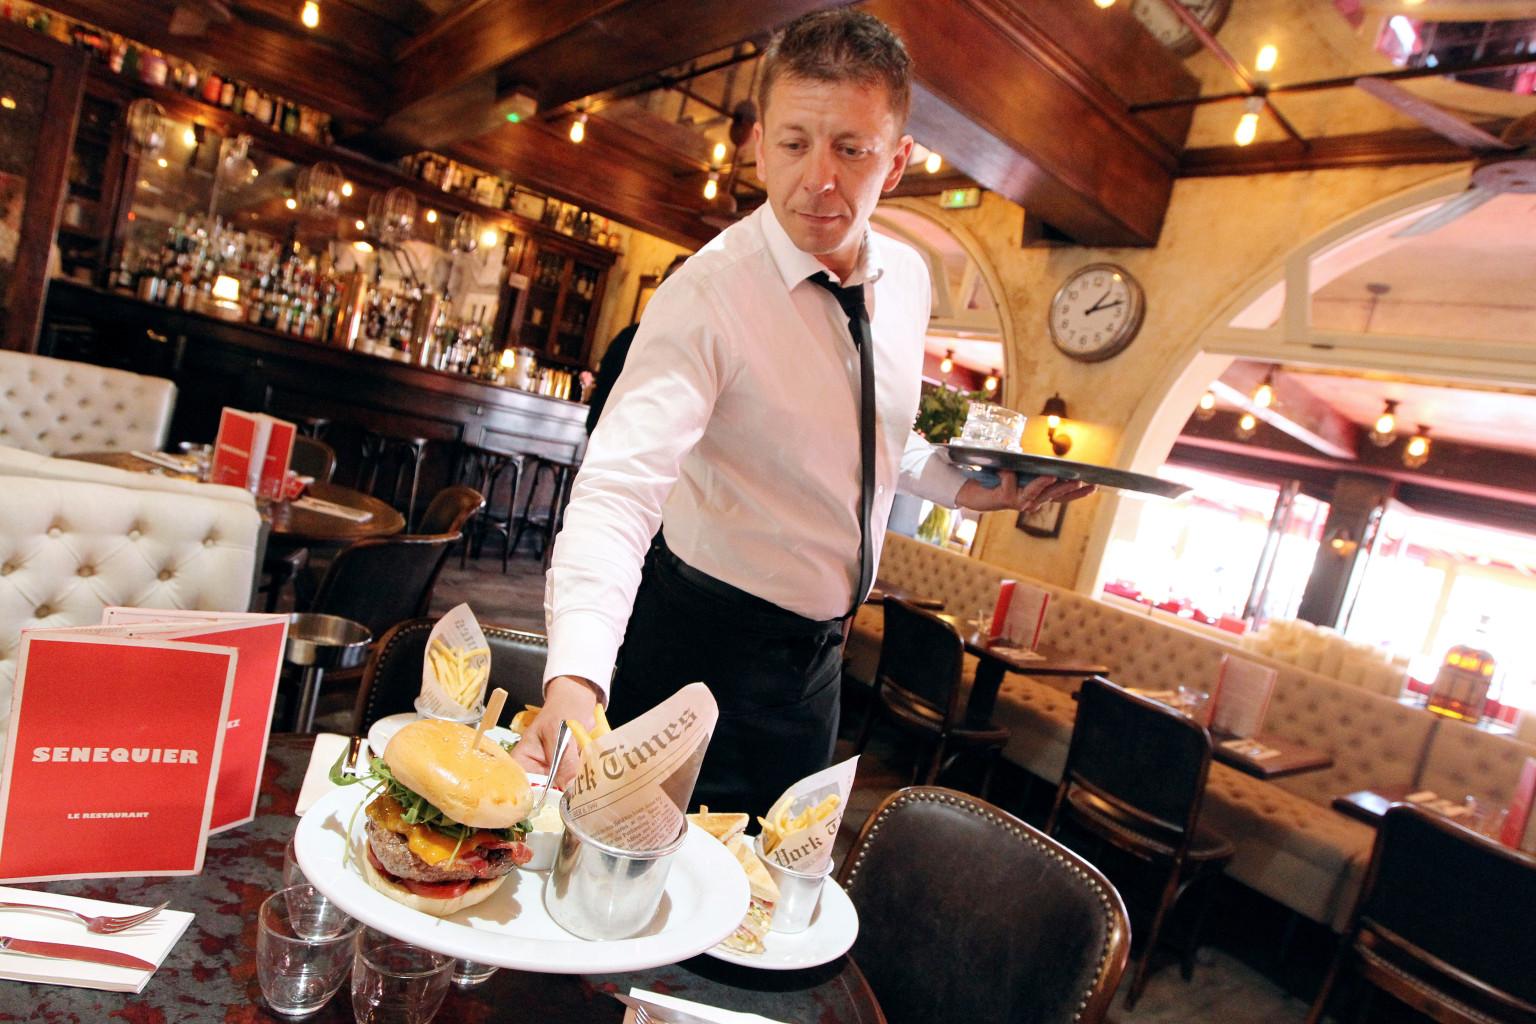 Restaurant Server Jobs In Moline Il